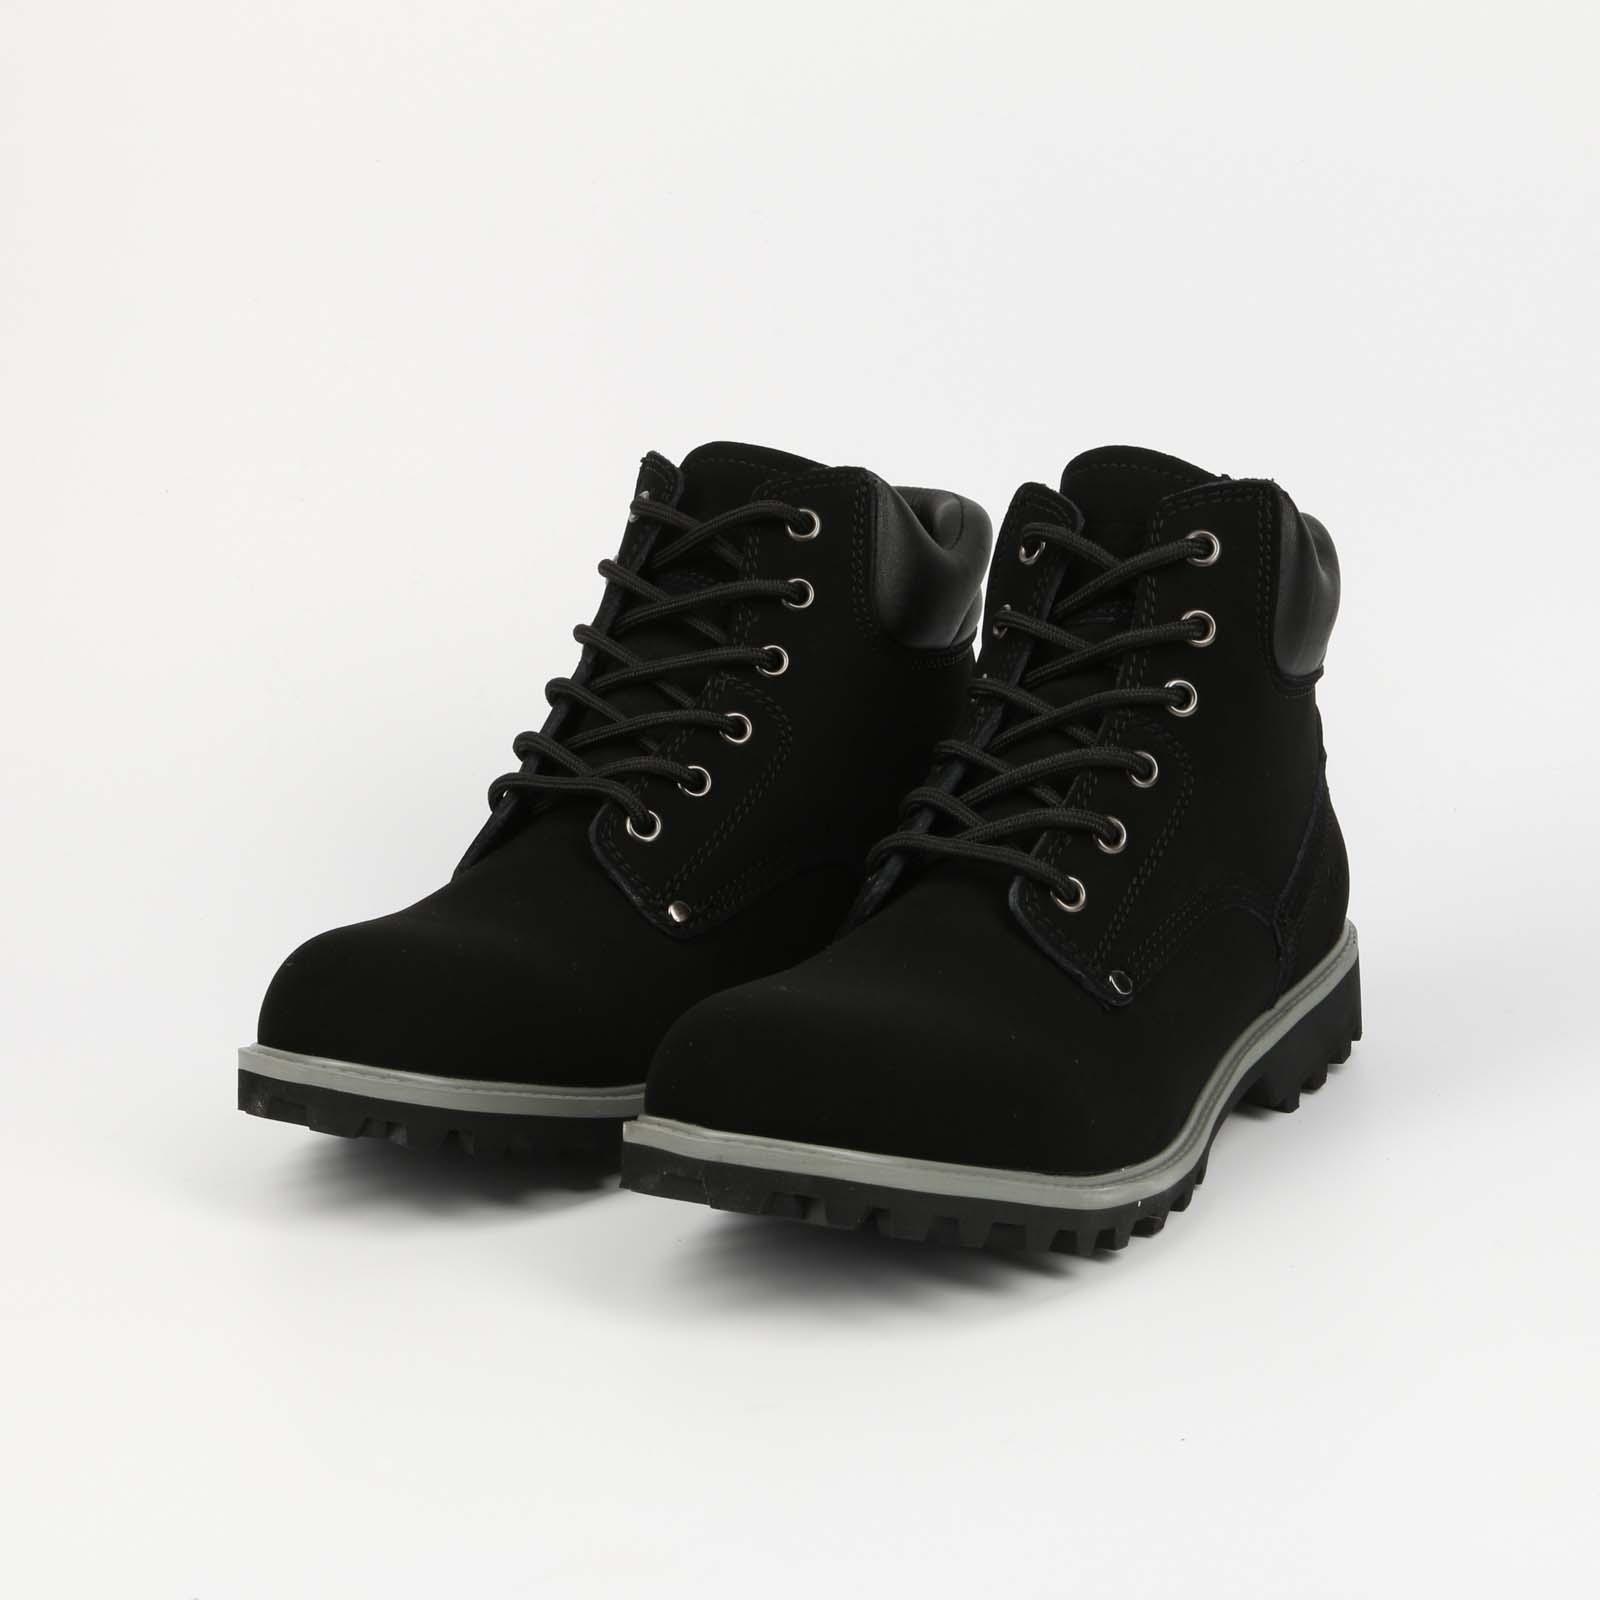 Ботинки мужские STAMFORD